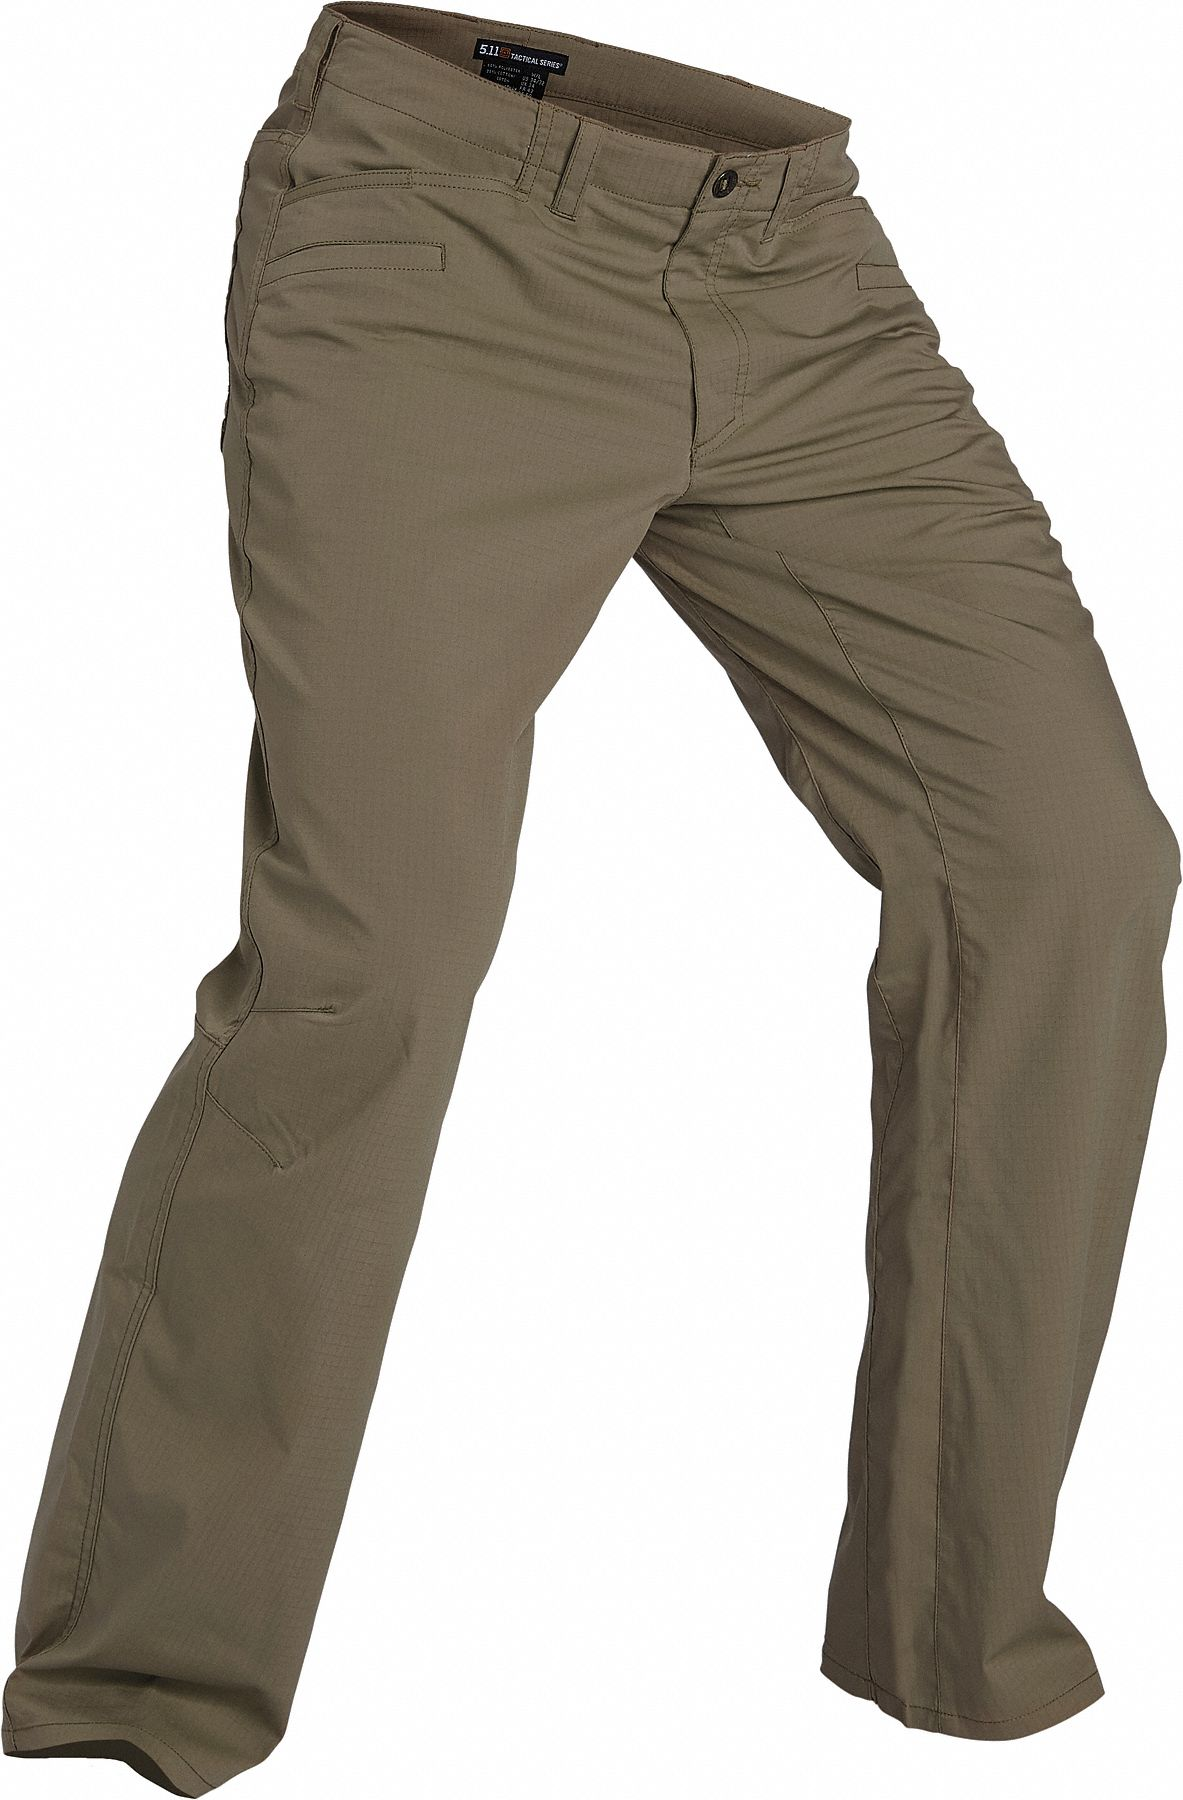 bd4b4238 5.11 TACTICAL Ridgeline Pants. Size: 44